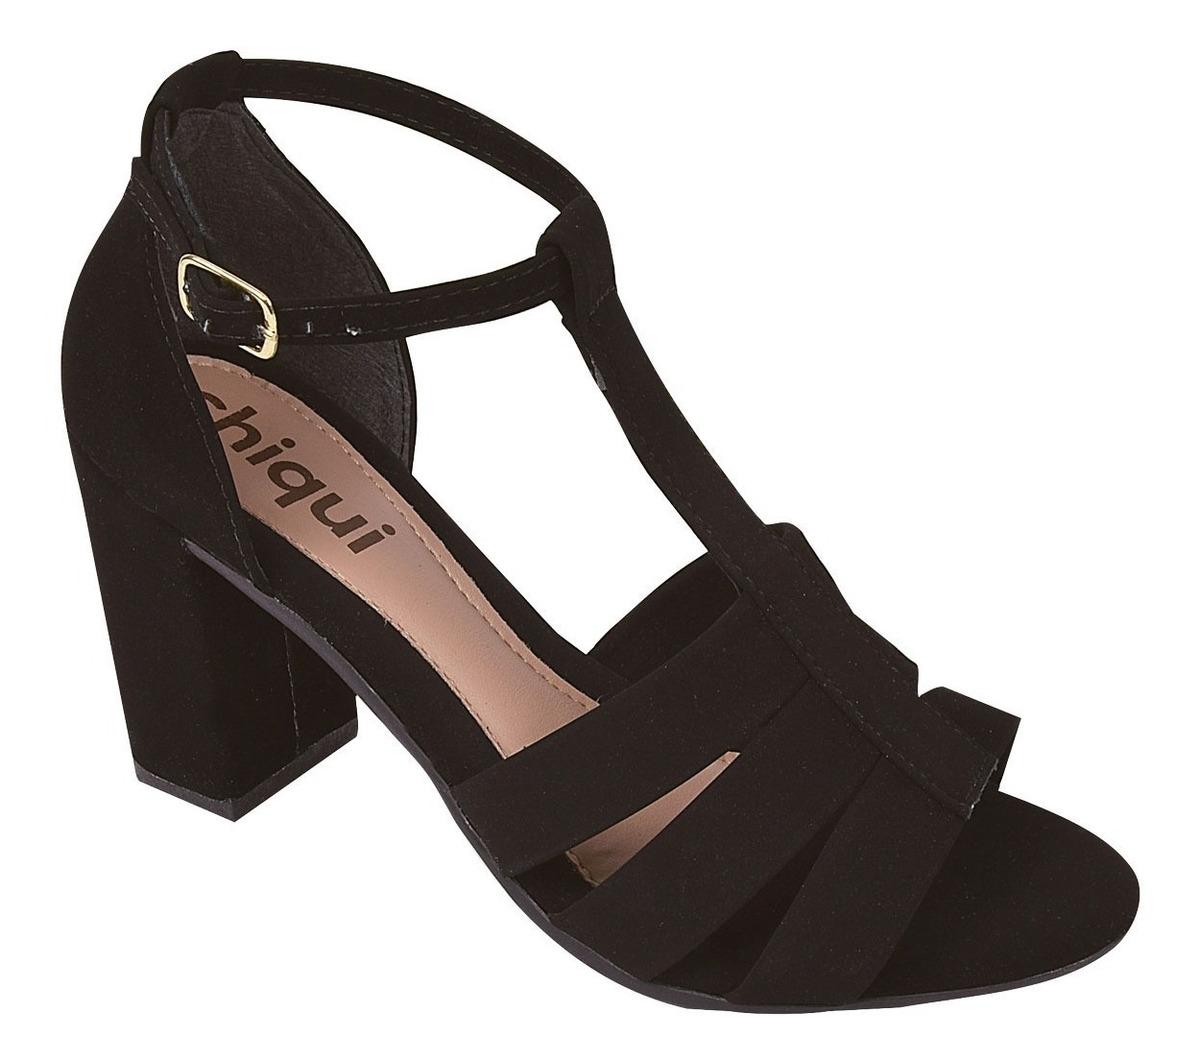 2bcf6df40 sandalia feminina salto alto grosso moda 2019 festa yrt21. Carregando zoom.